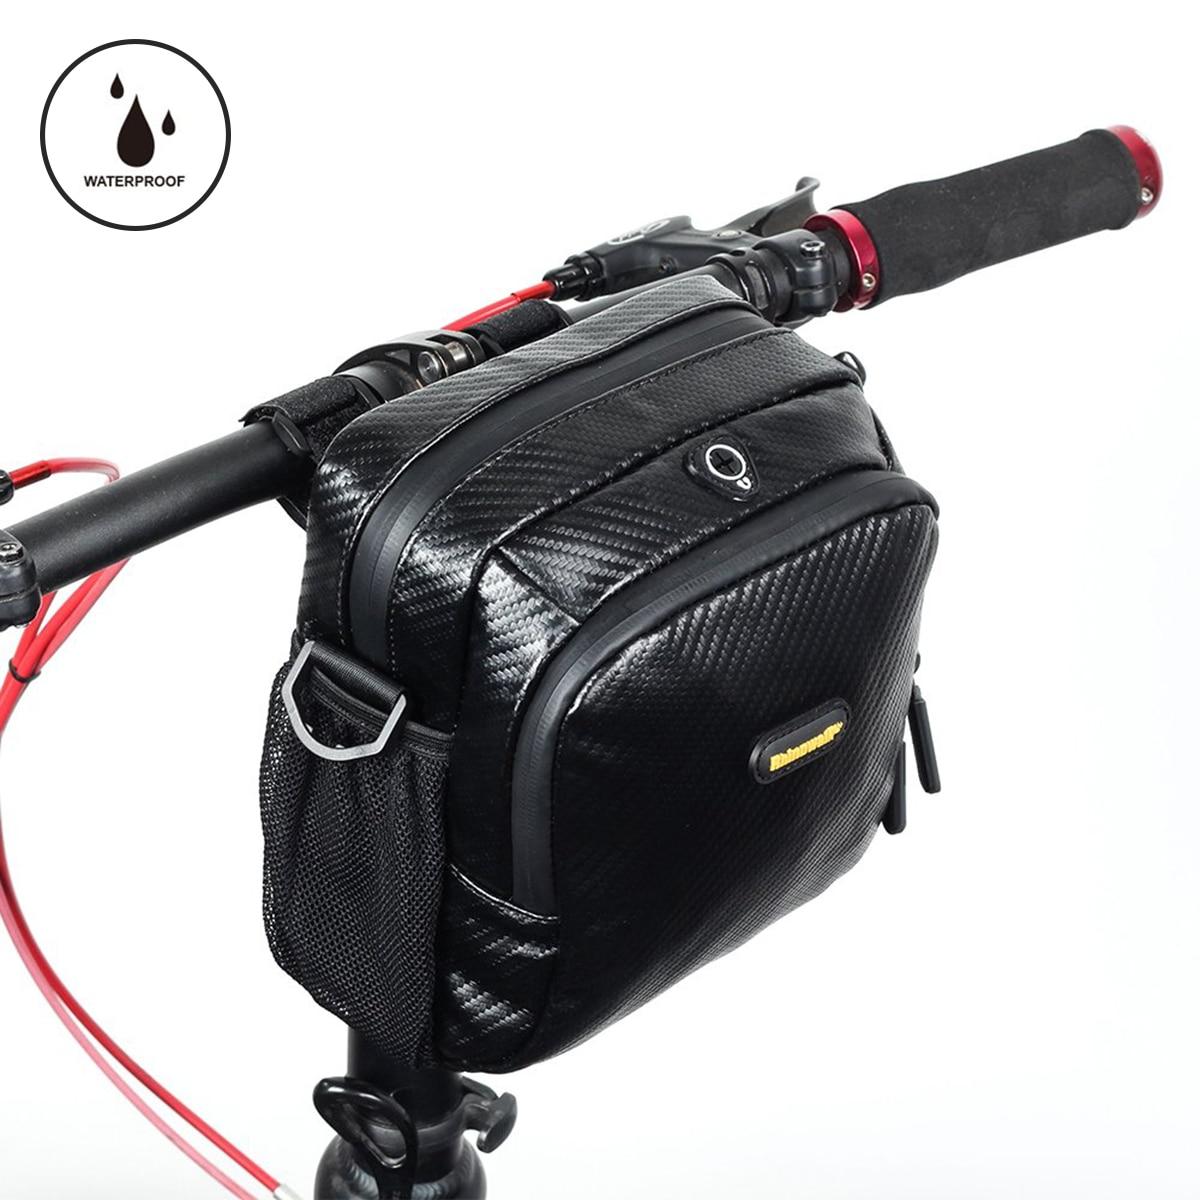 Waterproof  dustproof Bicycle Front Tube Bags Big Capacity MTB Cycling Handlebar Bags Front Frame Trunk Pannier Bike Accessories